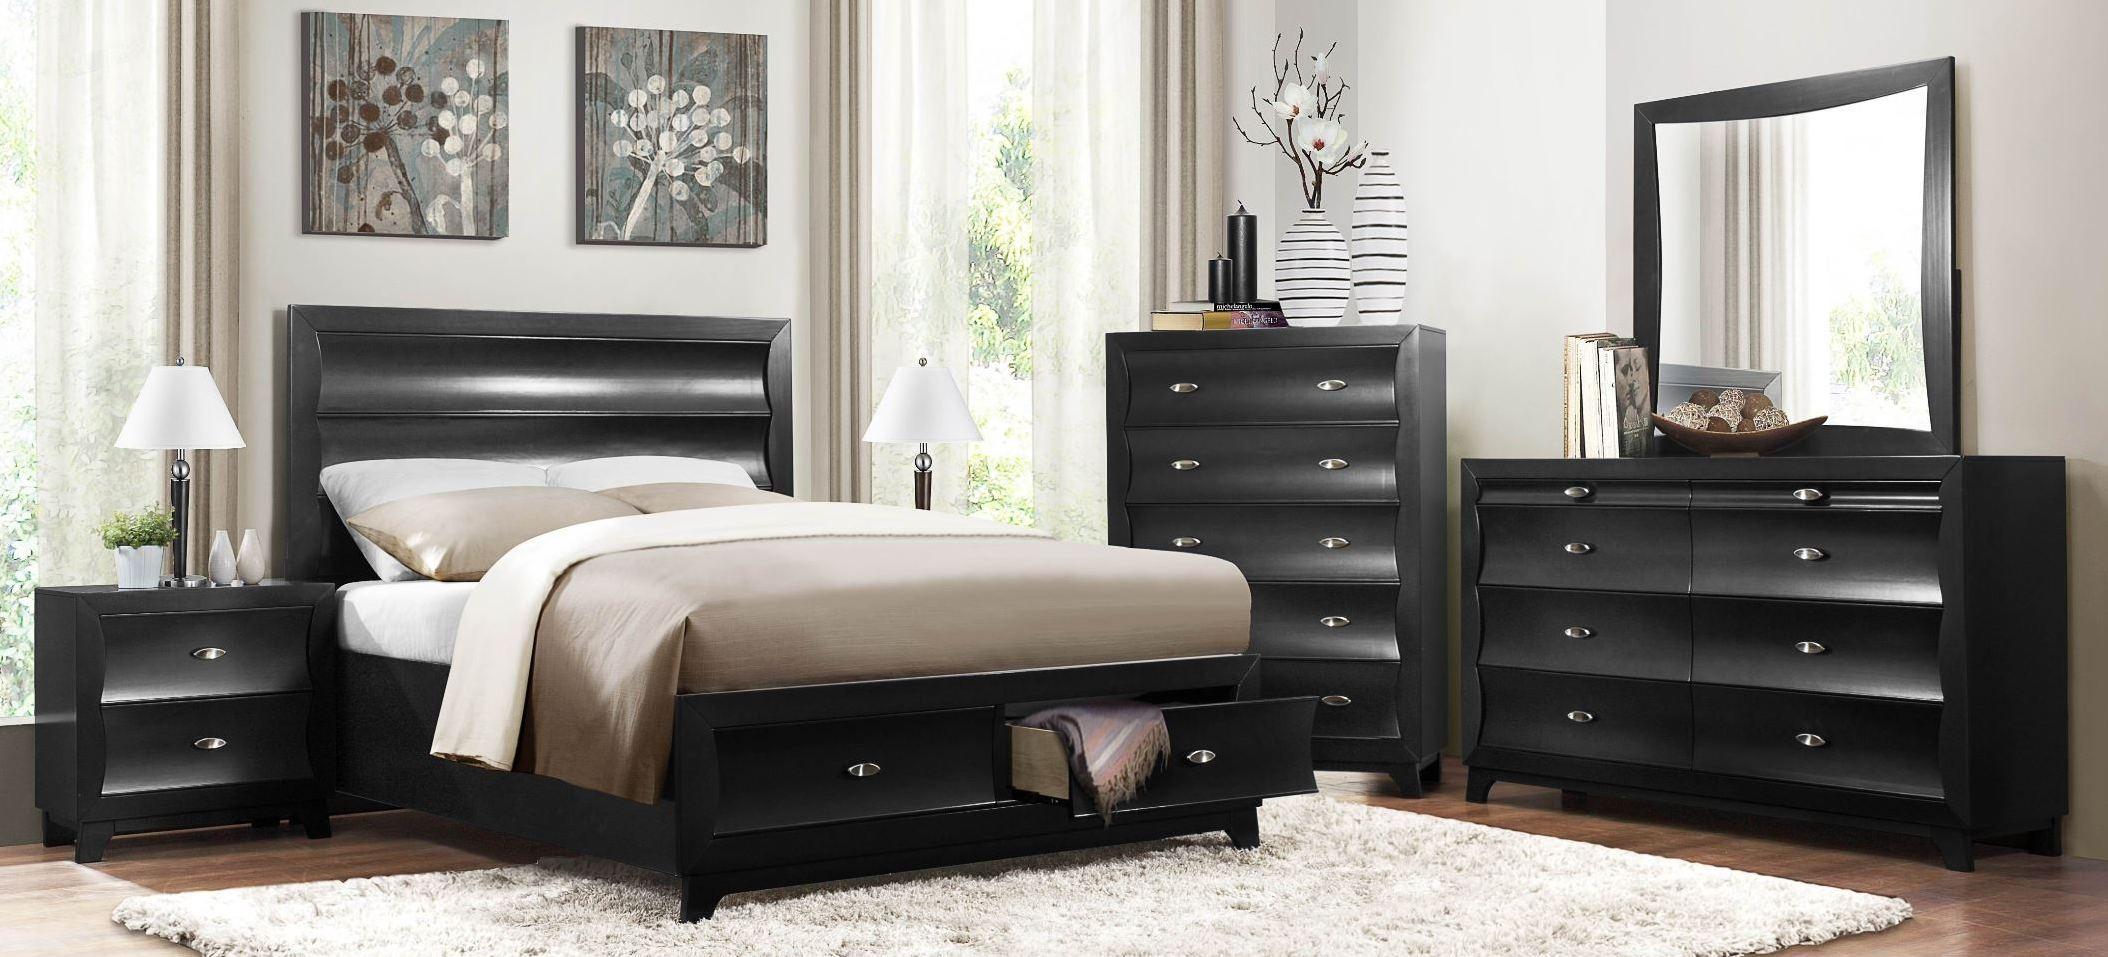 Zandra Black Platform Storage Bedroom Set from Homelegance